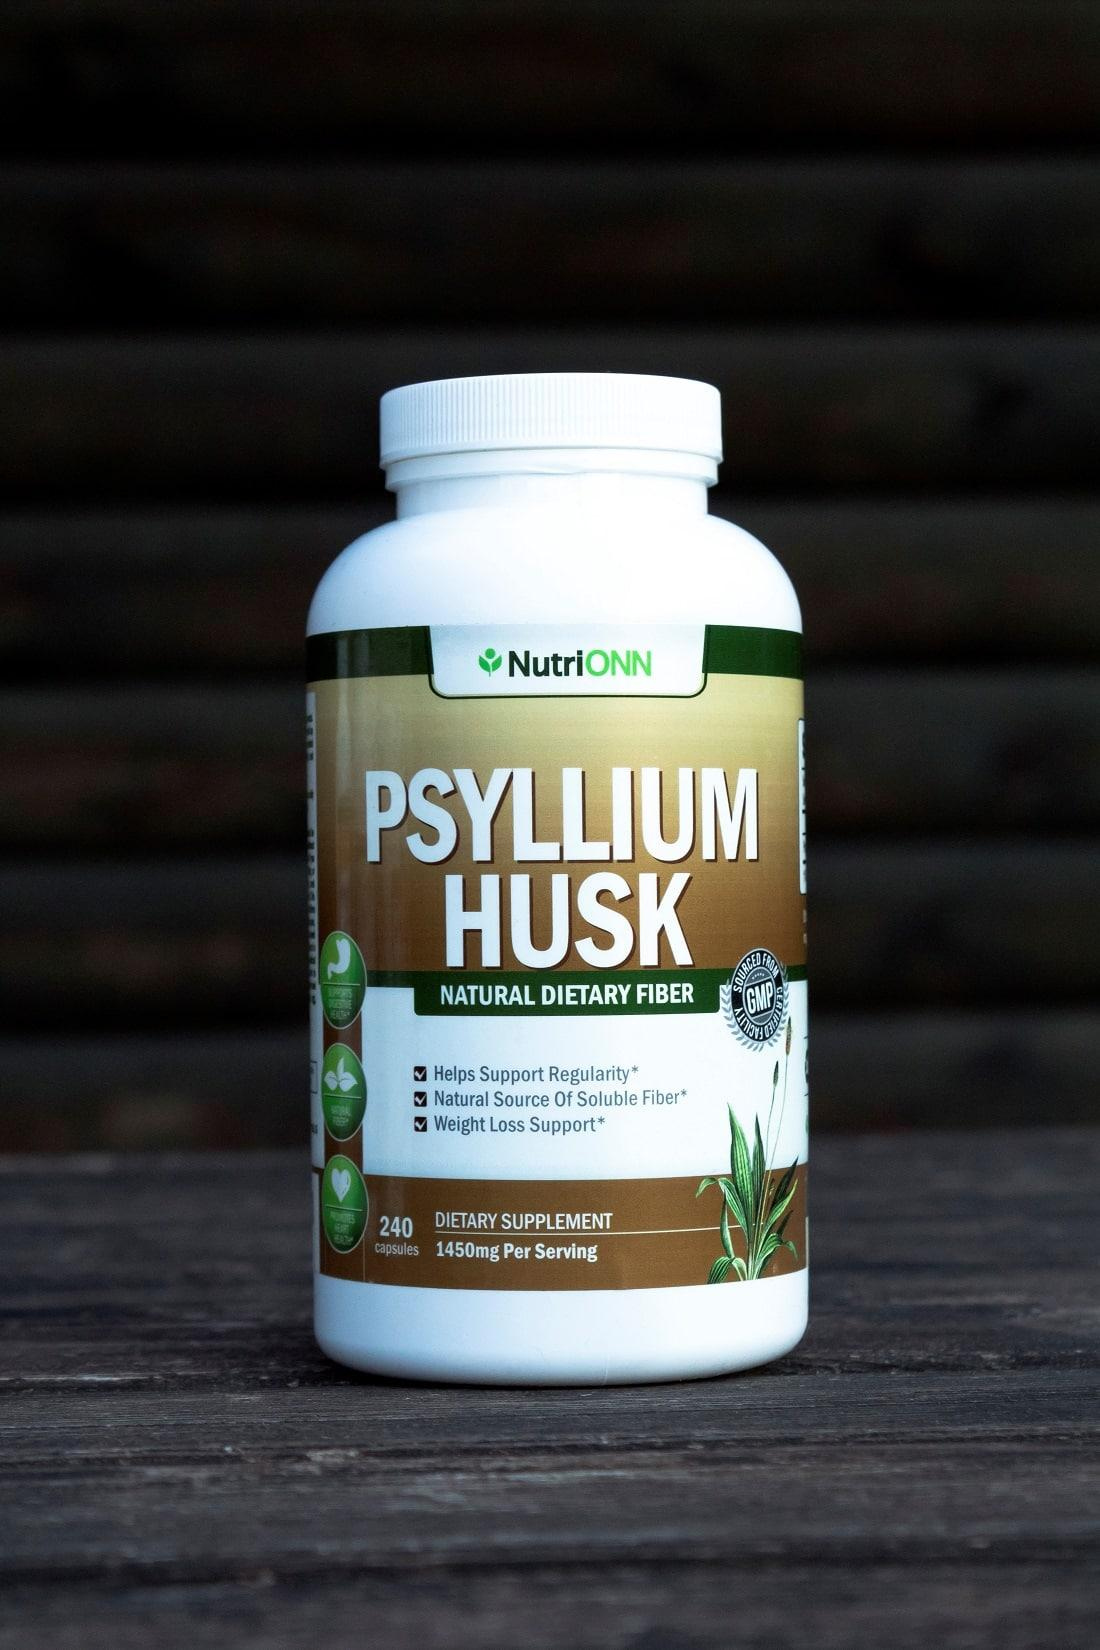 psyllium husk health benefits